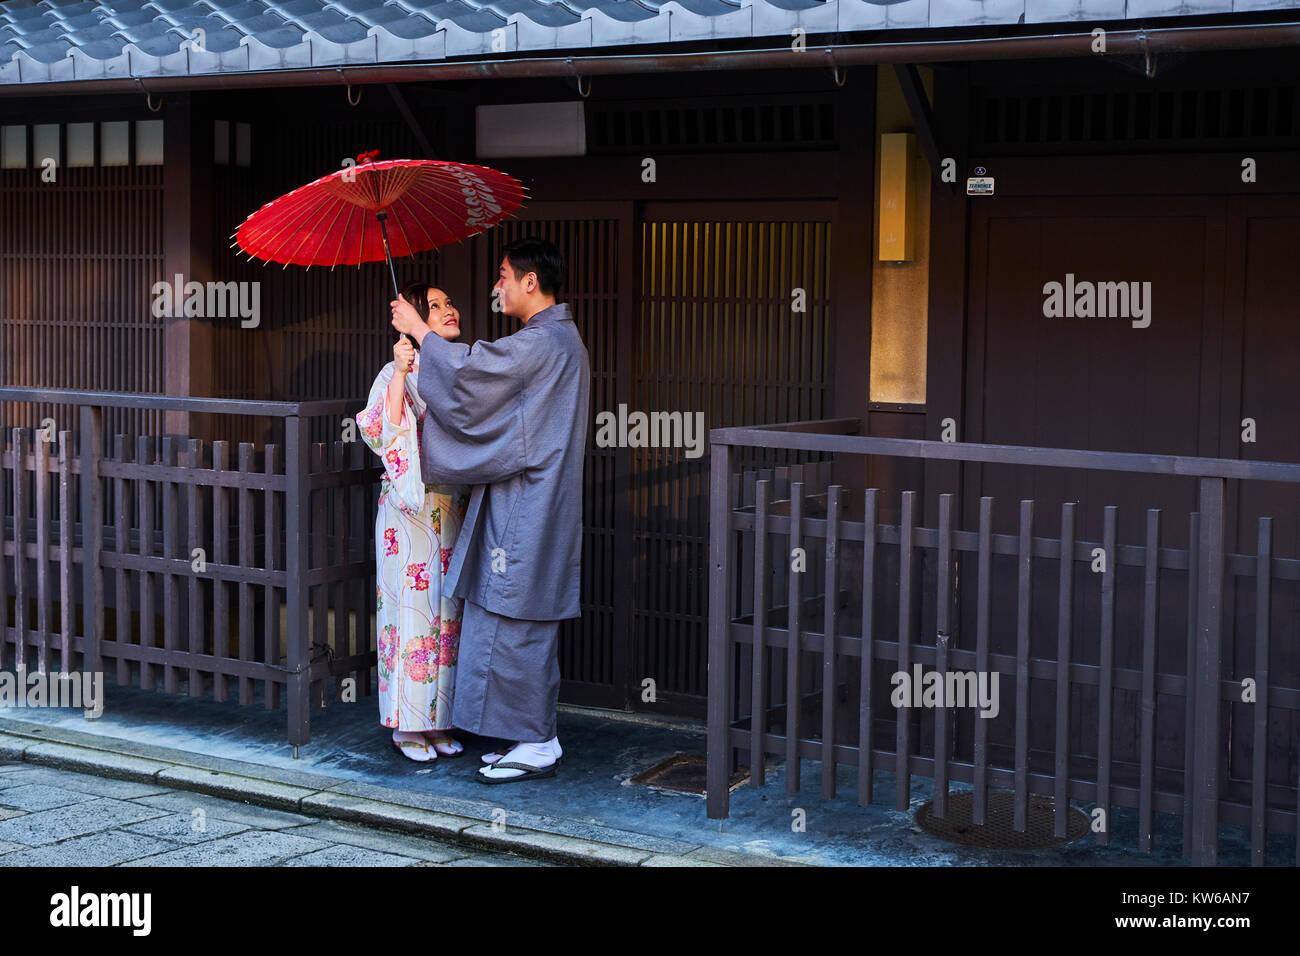 Japan, Honshu island, Kansai region, Kyoto, Gion, Geisha former area, young couple in kimono Stock Photo